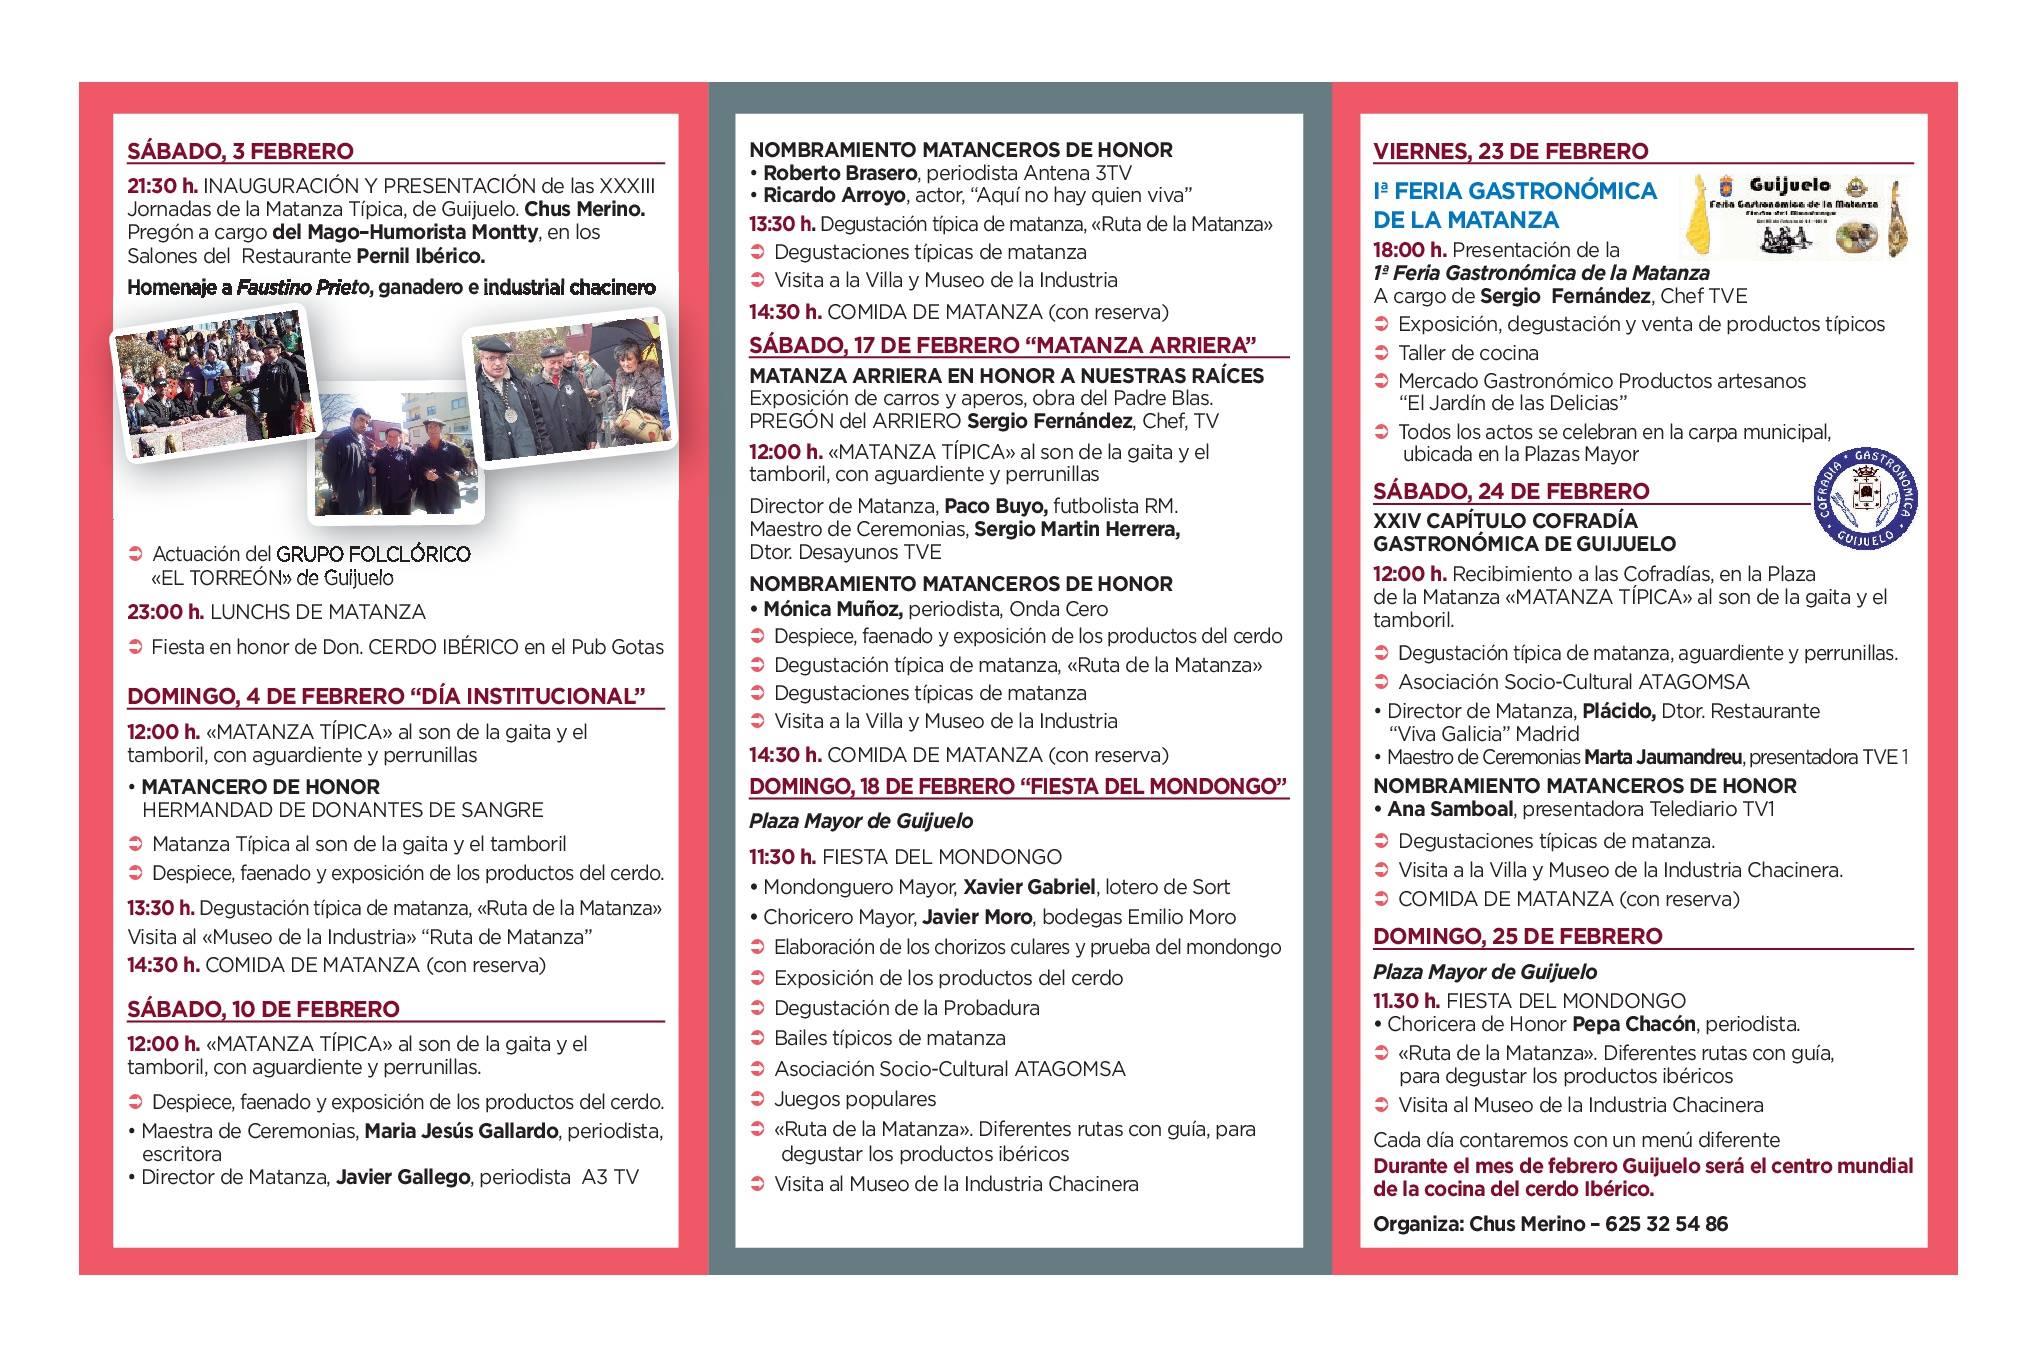 Programa Guijuelo XXXIII Jornadas de la Matanza Típica Febrero 2018